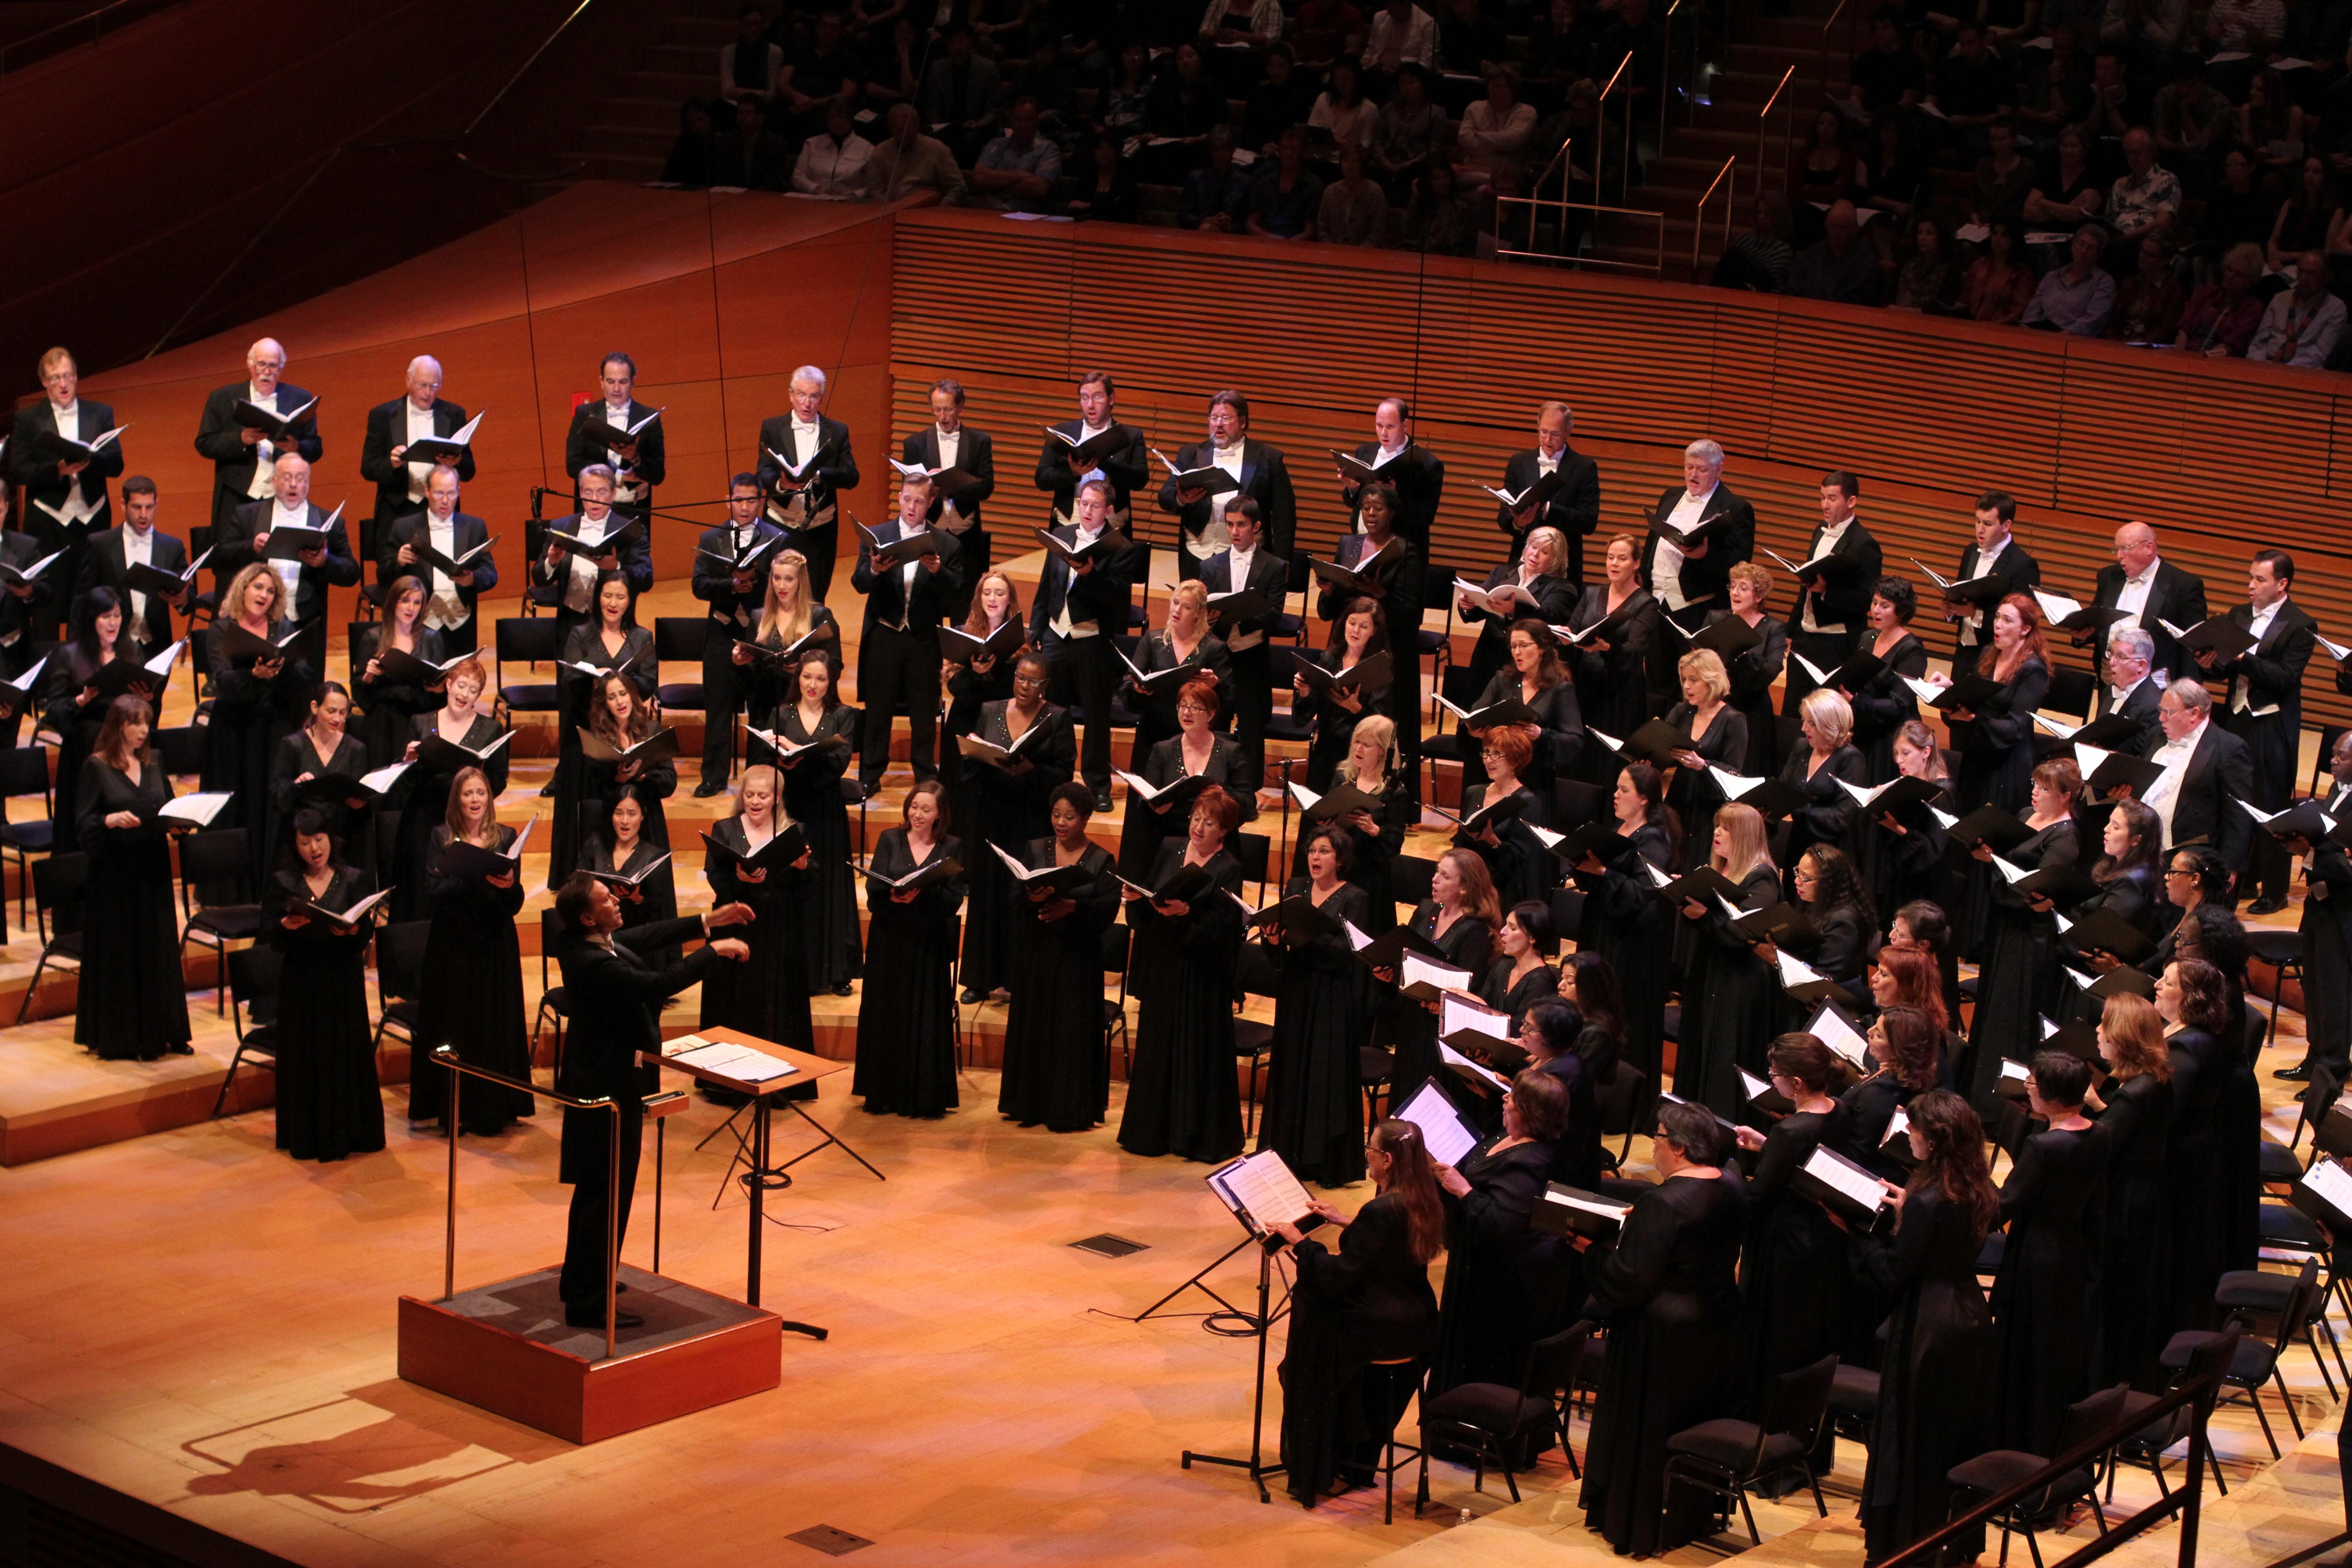 los angeles master chorale cantaloupe music rh cantaloupemusic com los angeles master chorale calendar los angeles master chorale members